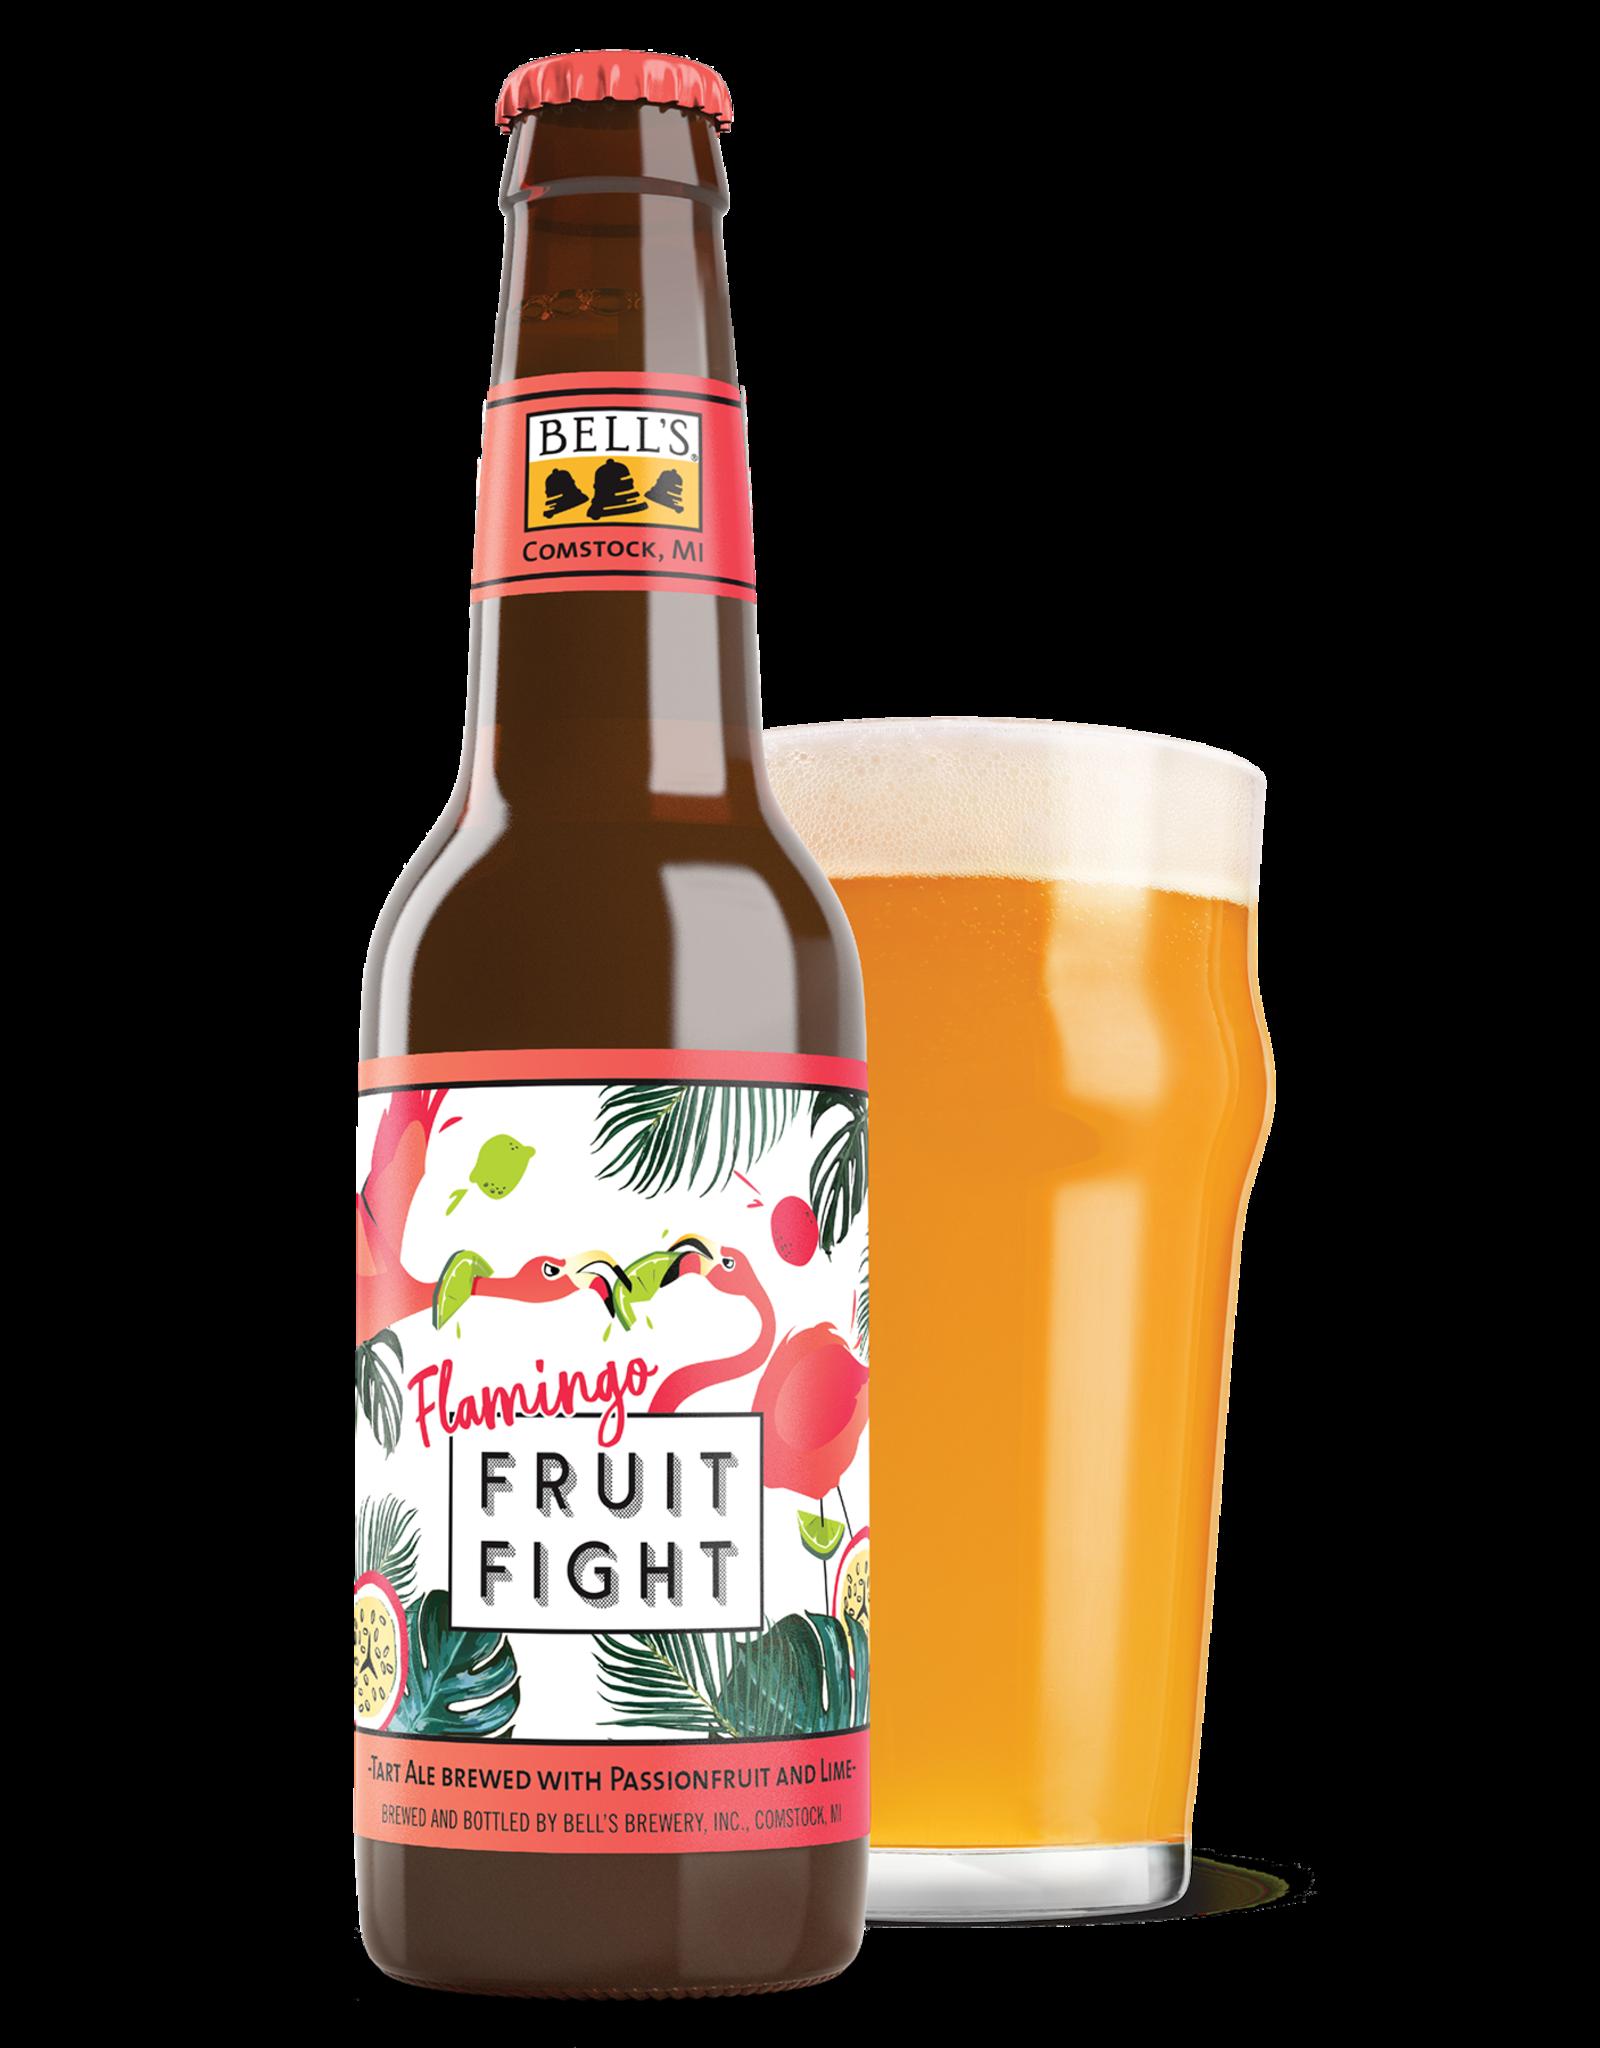 Bell's Bell's Flamingo Fruit Flight Tequila-Barrel Aged Ale